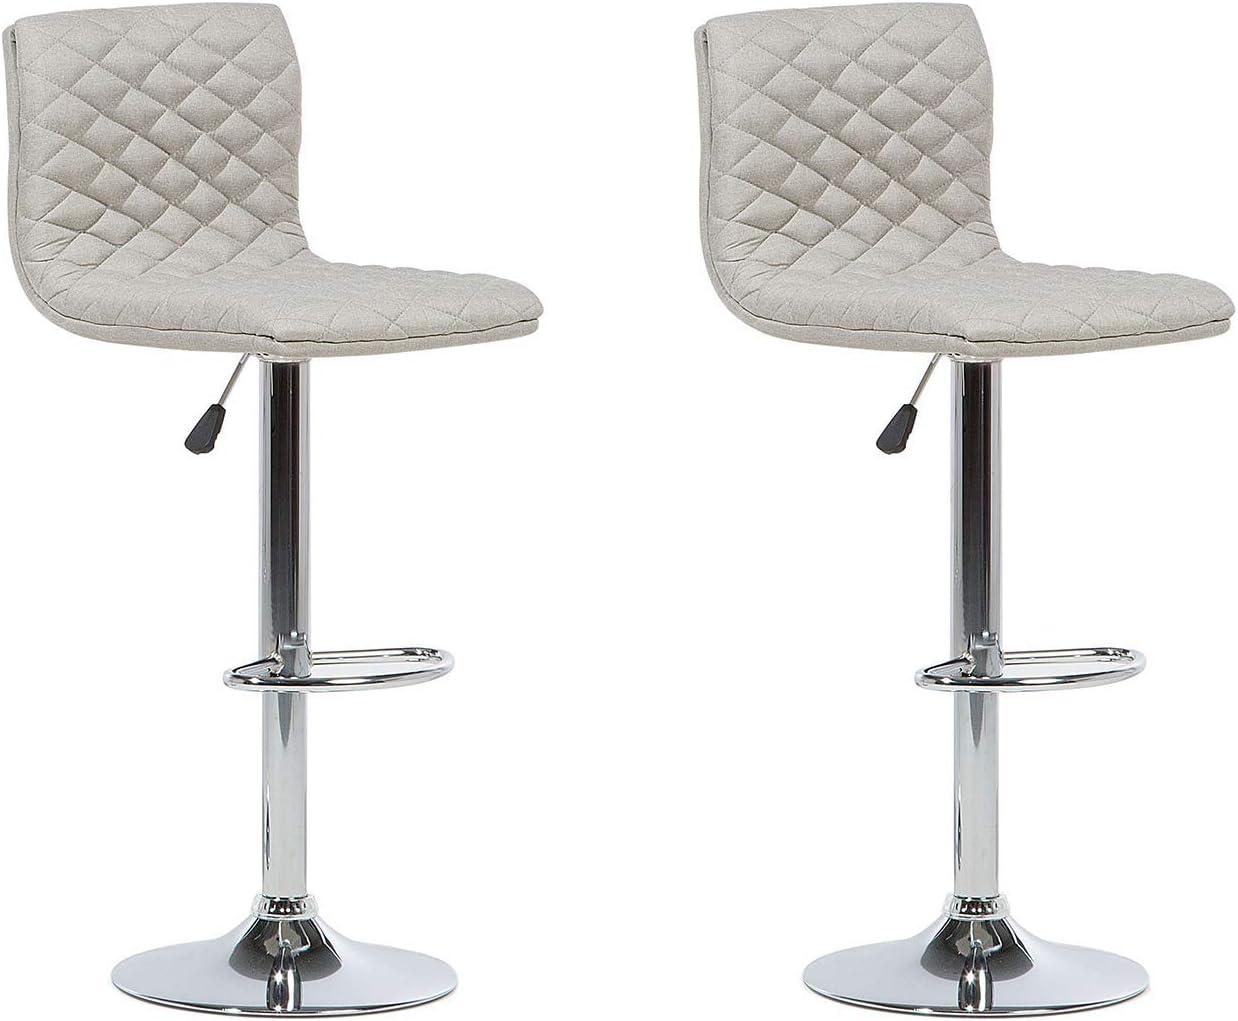 Modern Contemporary Set Of 2 Bar Stools 360 Swivel Adjustable Height Beige Orlando Beliani Amazon Co Uk Kitchen Home